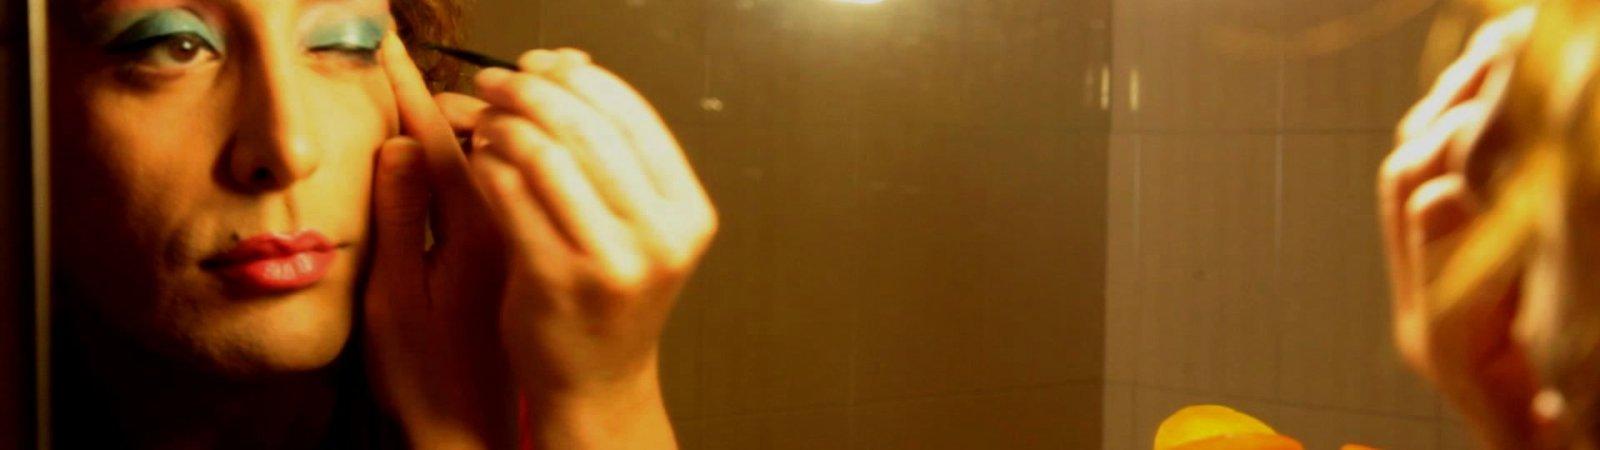 Photo dernier film Vanesa Prieto